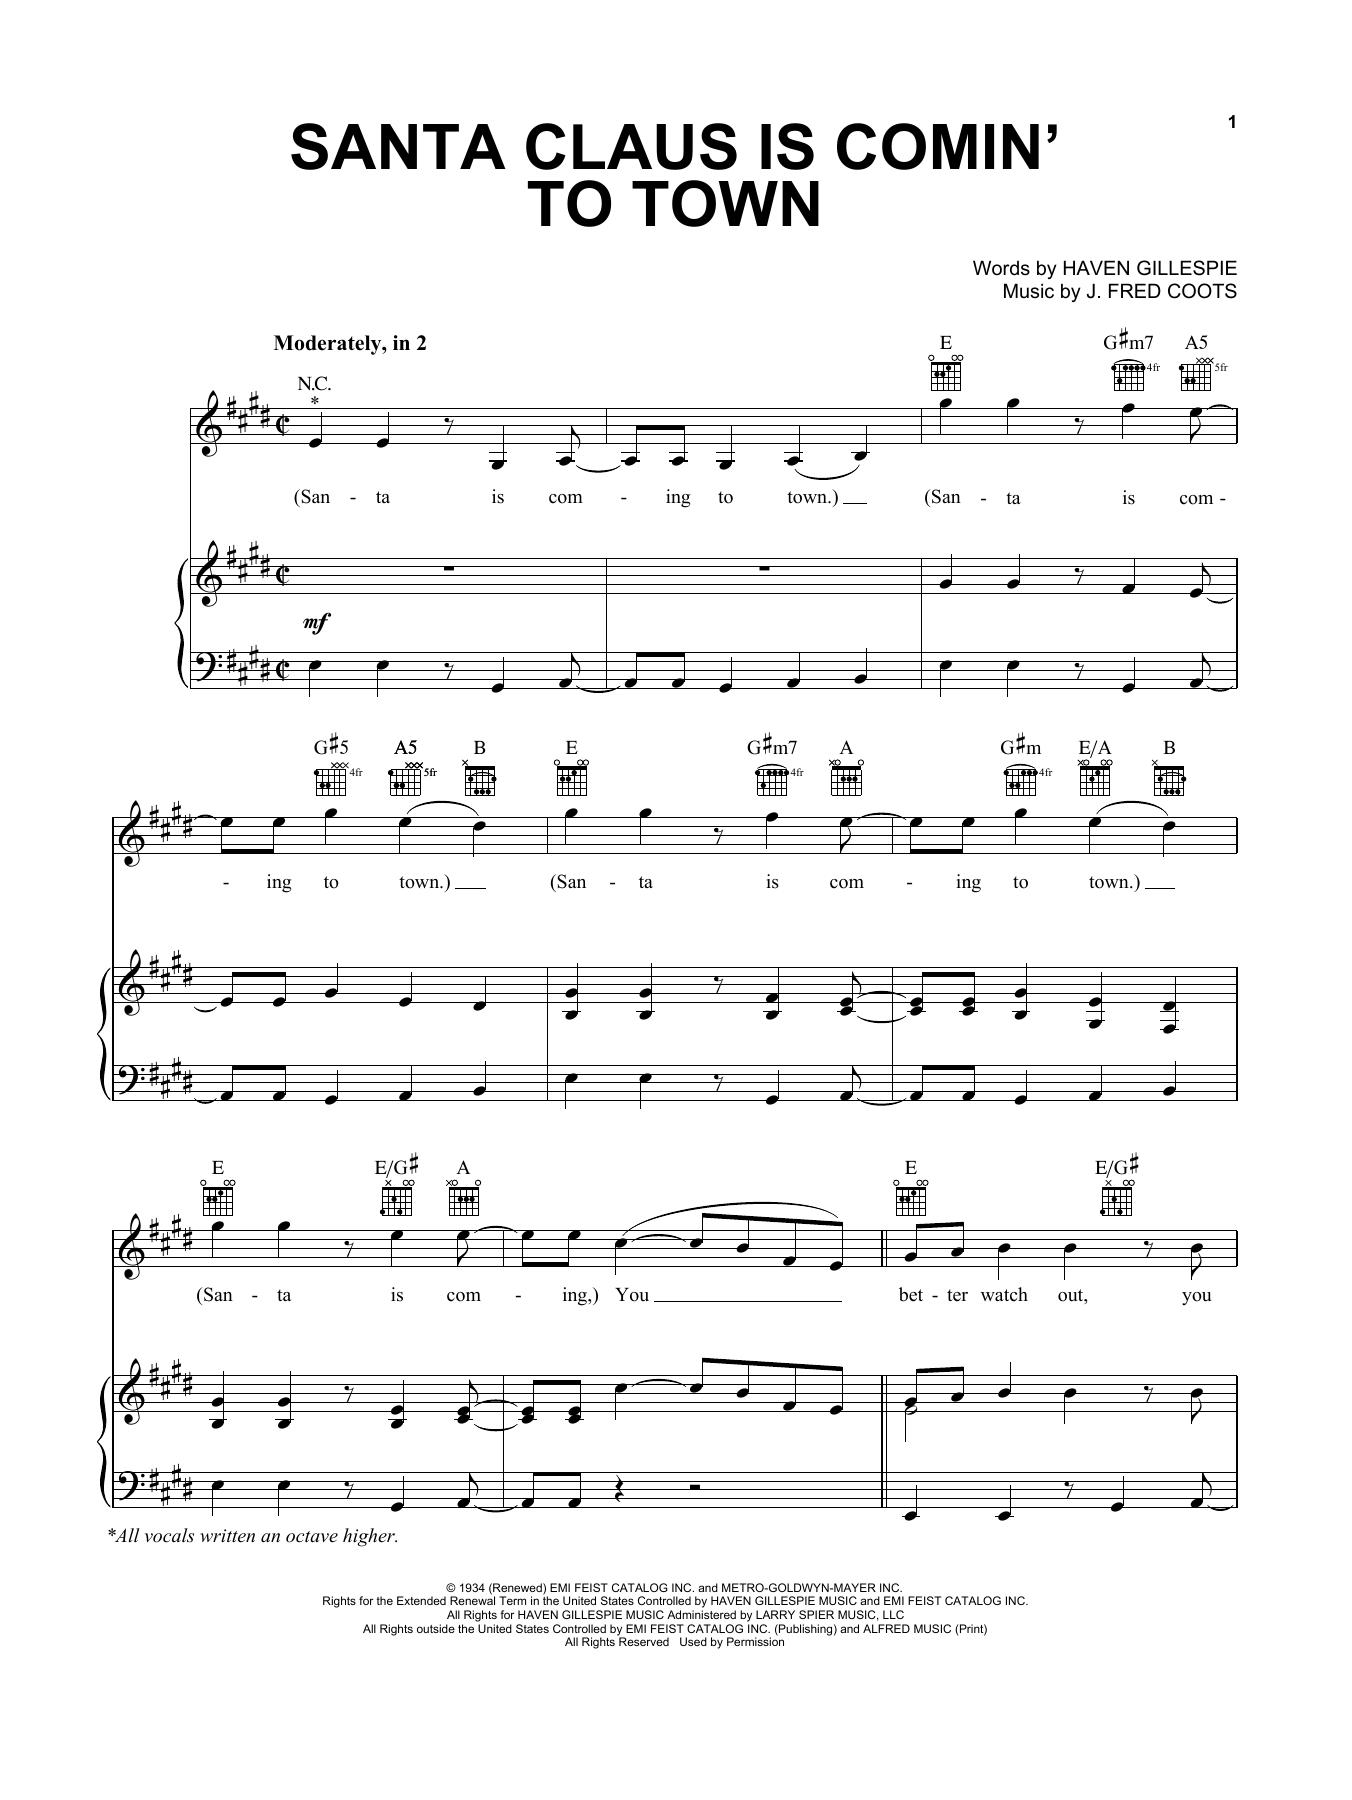 Pentatonix Santa Claus Is Comin To Town Sheet Music Notes Chords